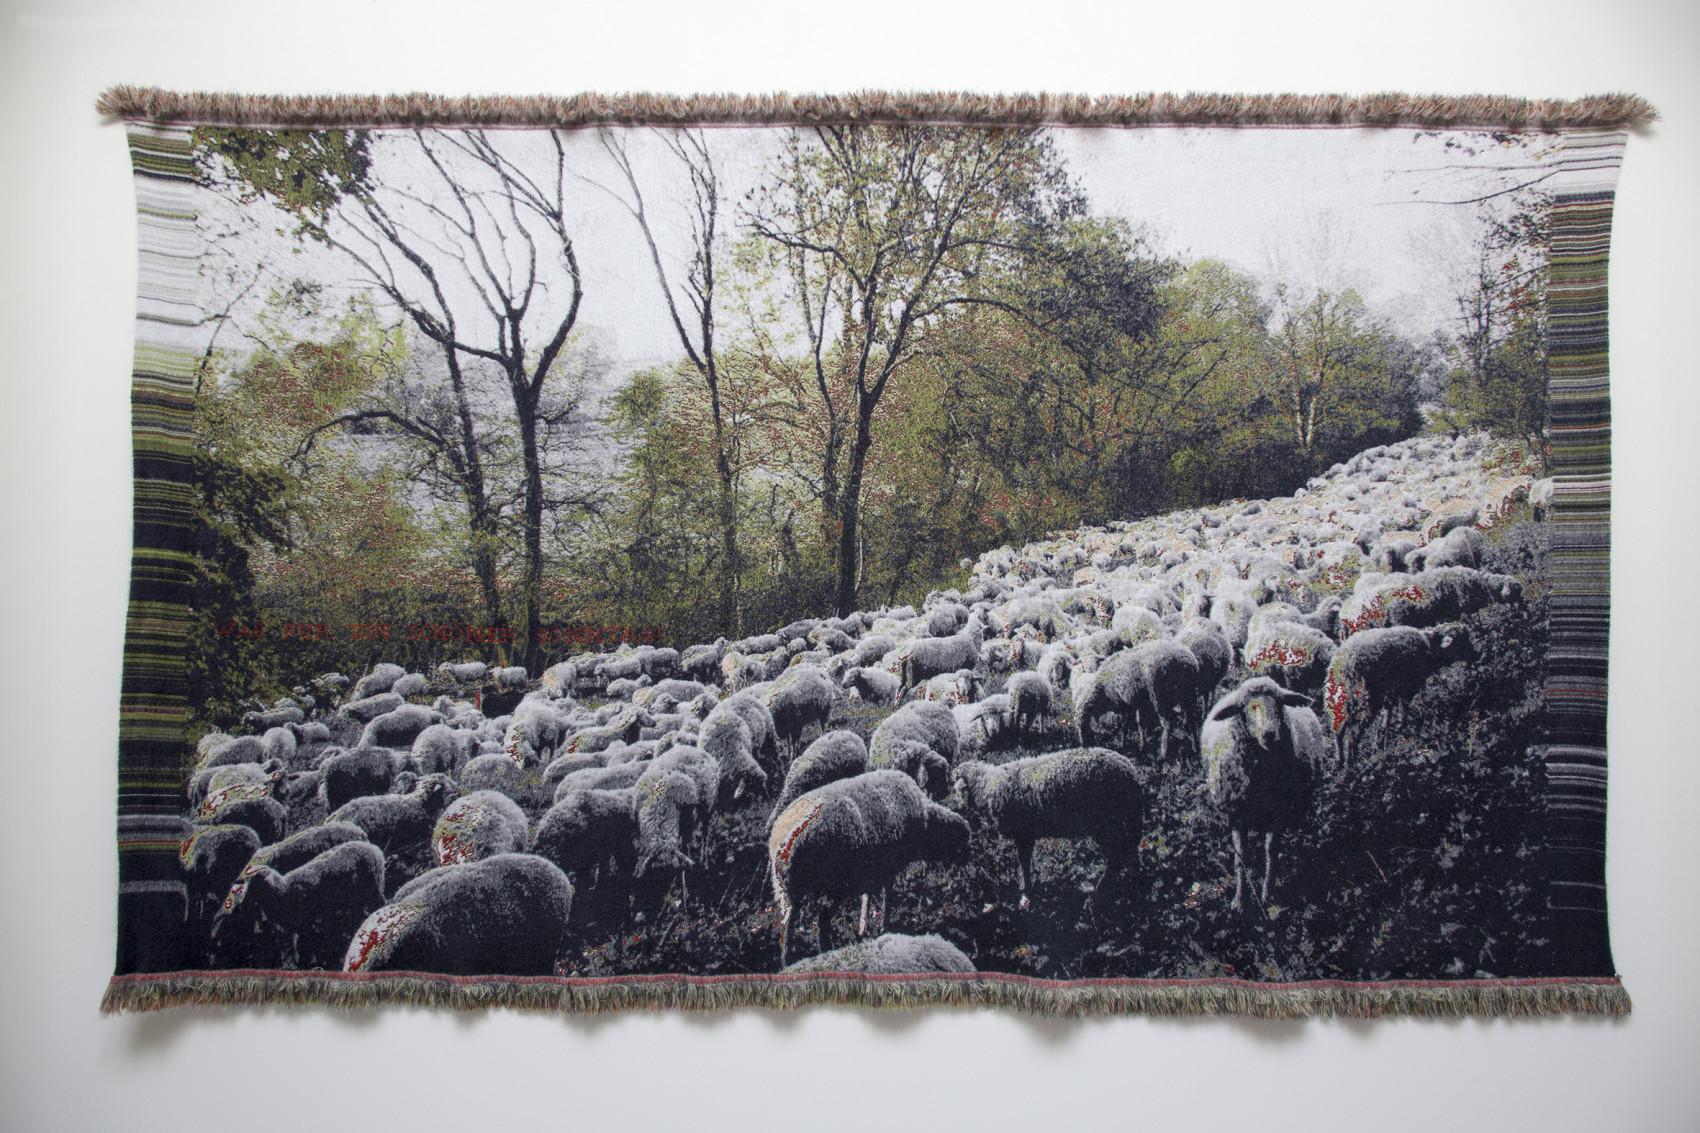 'Was für ein schöner Sonntag' - (booktitle ofJorge Semprún) - Weimar, Buchenwald- Jacquard woven -double weaves- mohair andcashwool -text embroidered by hand - 170 x 290 cm - 2015